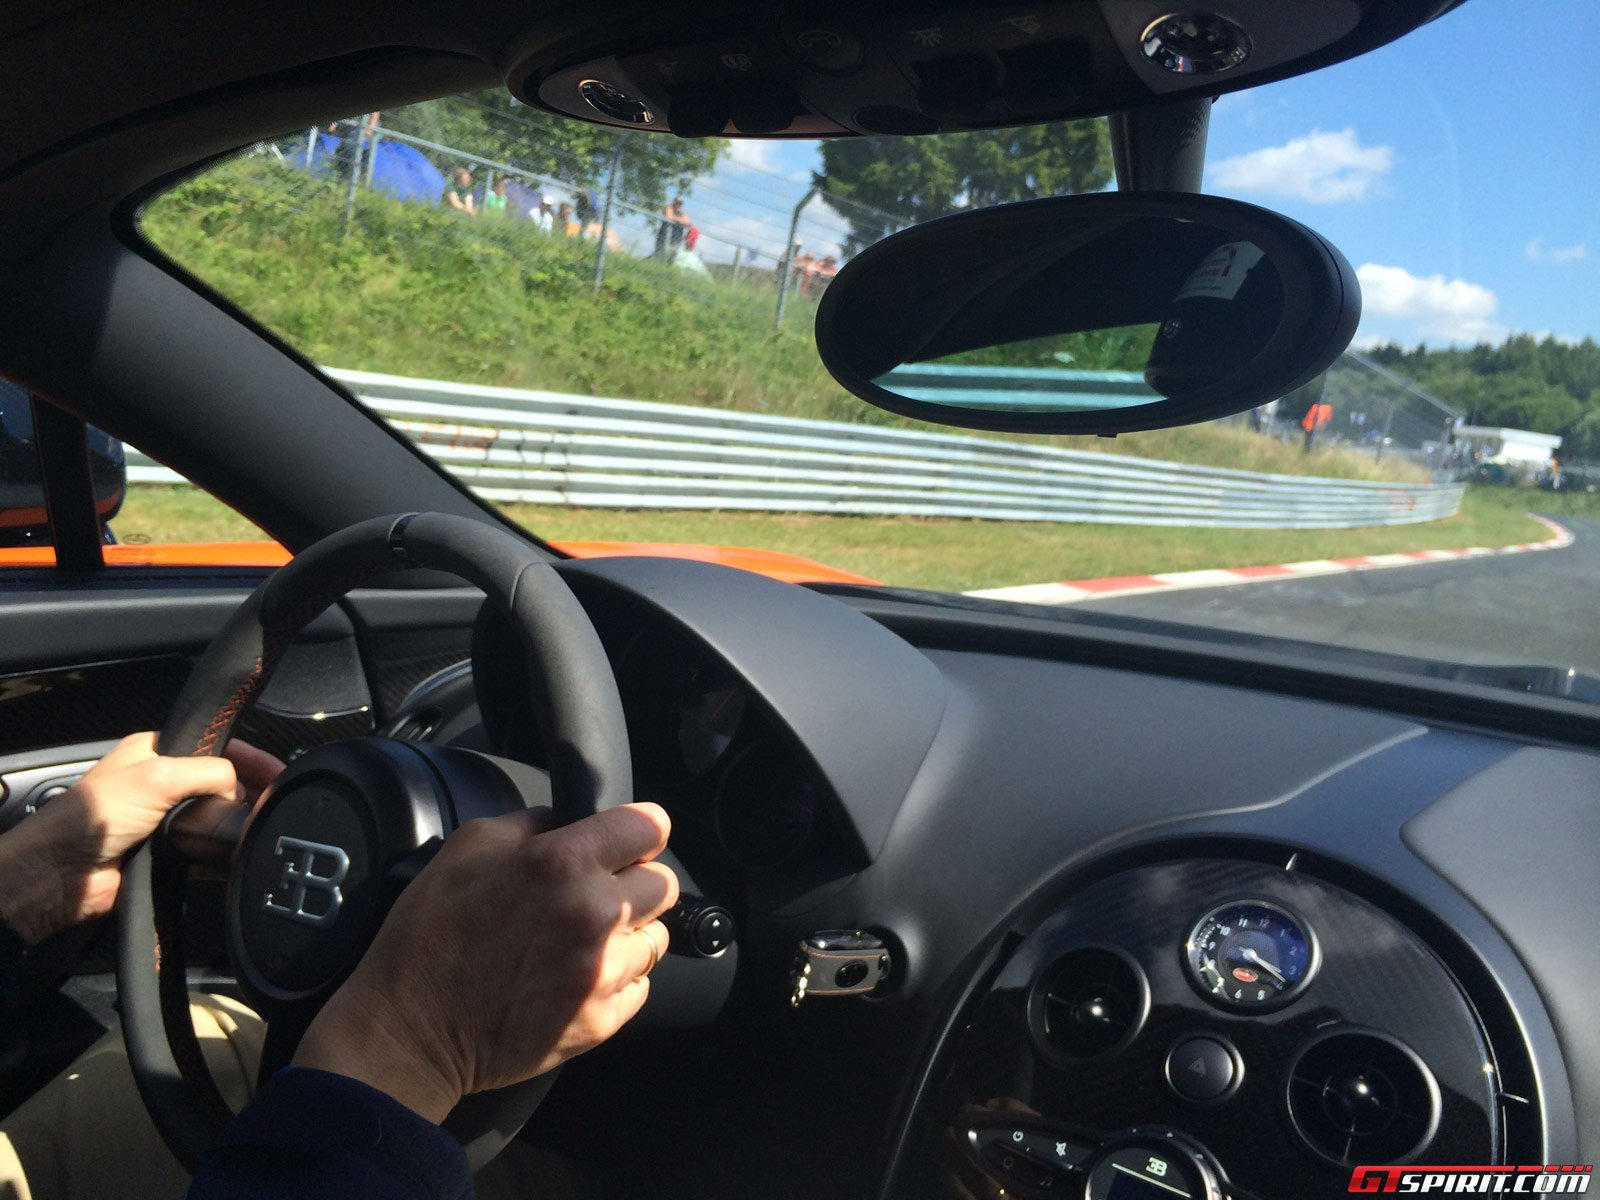 Bugatti-Veyron-Grand-Sport-Vitesse-WRC-Onboard Inspiring Bugatti Veyron Grand Sport Vitesse Wrc Cars Trend